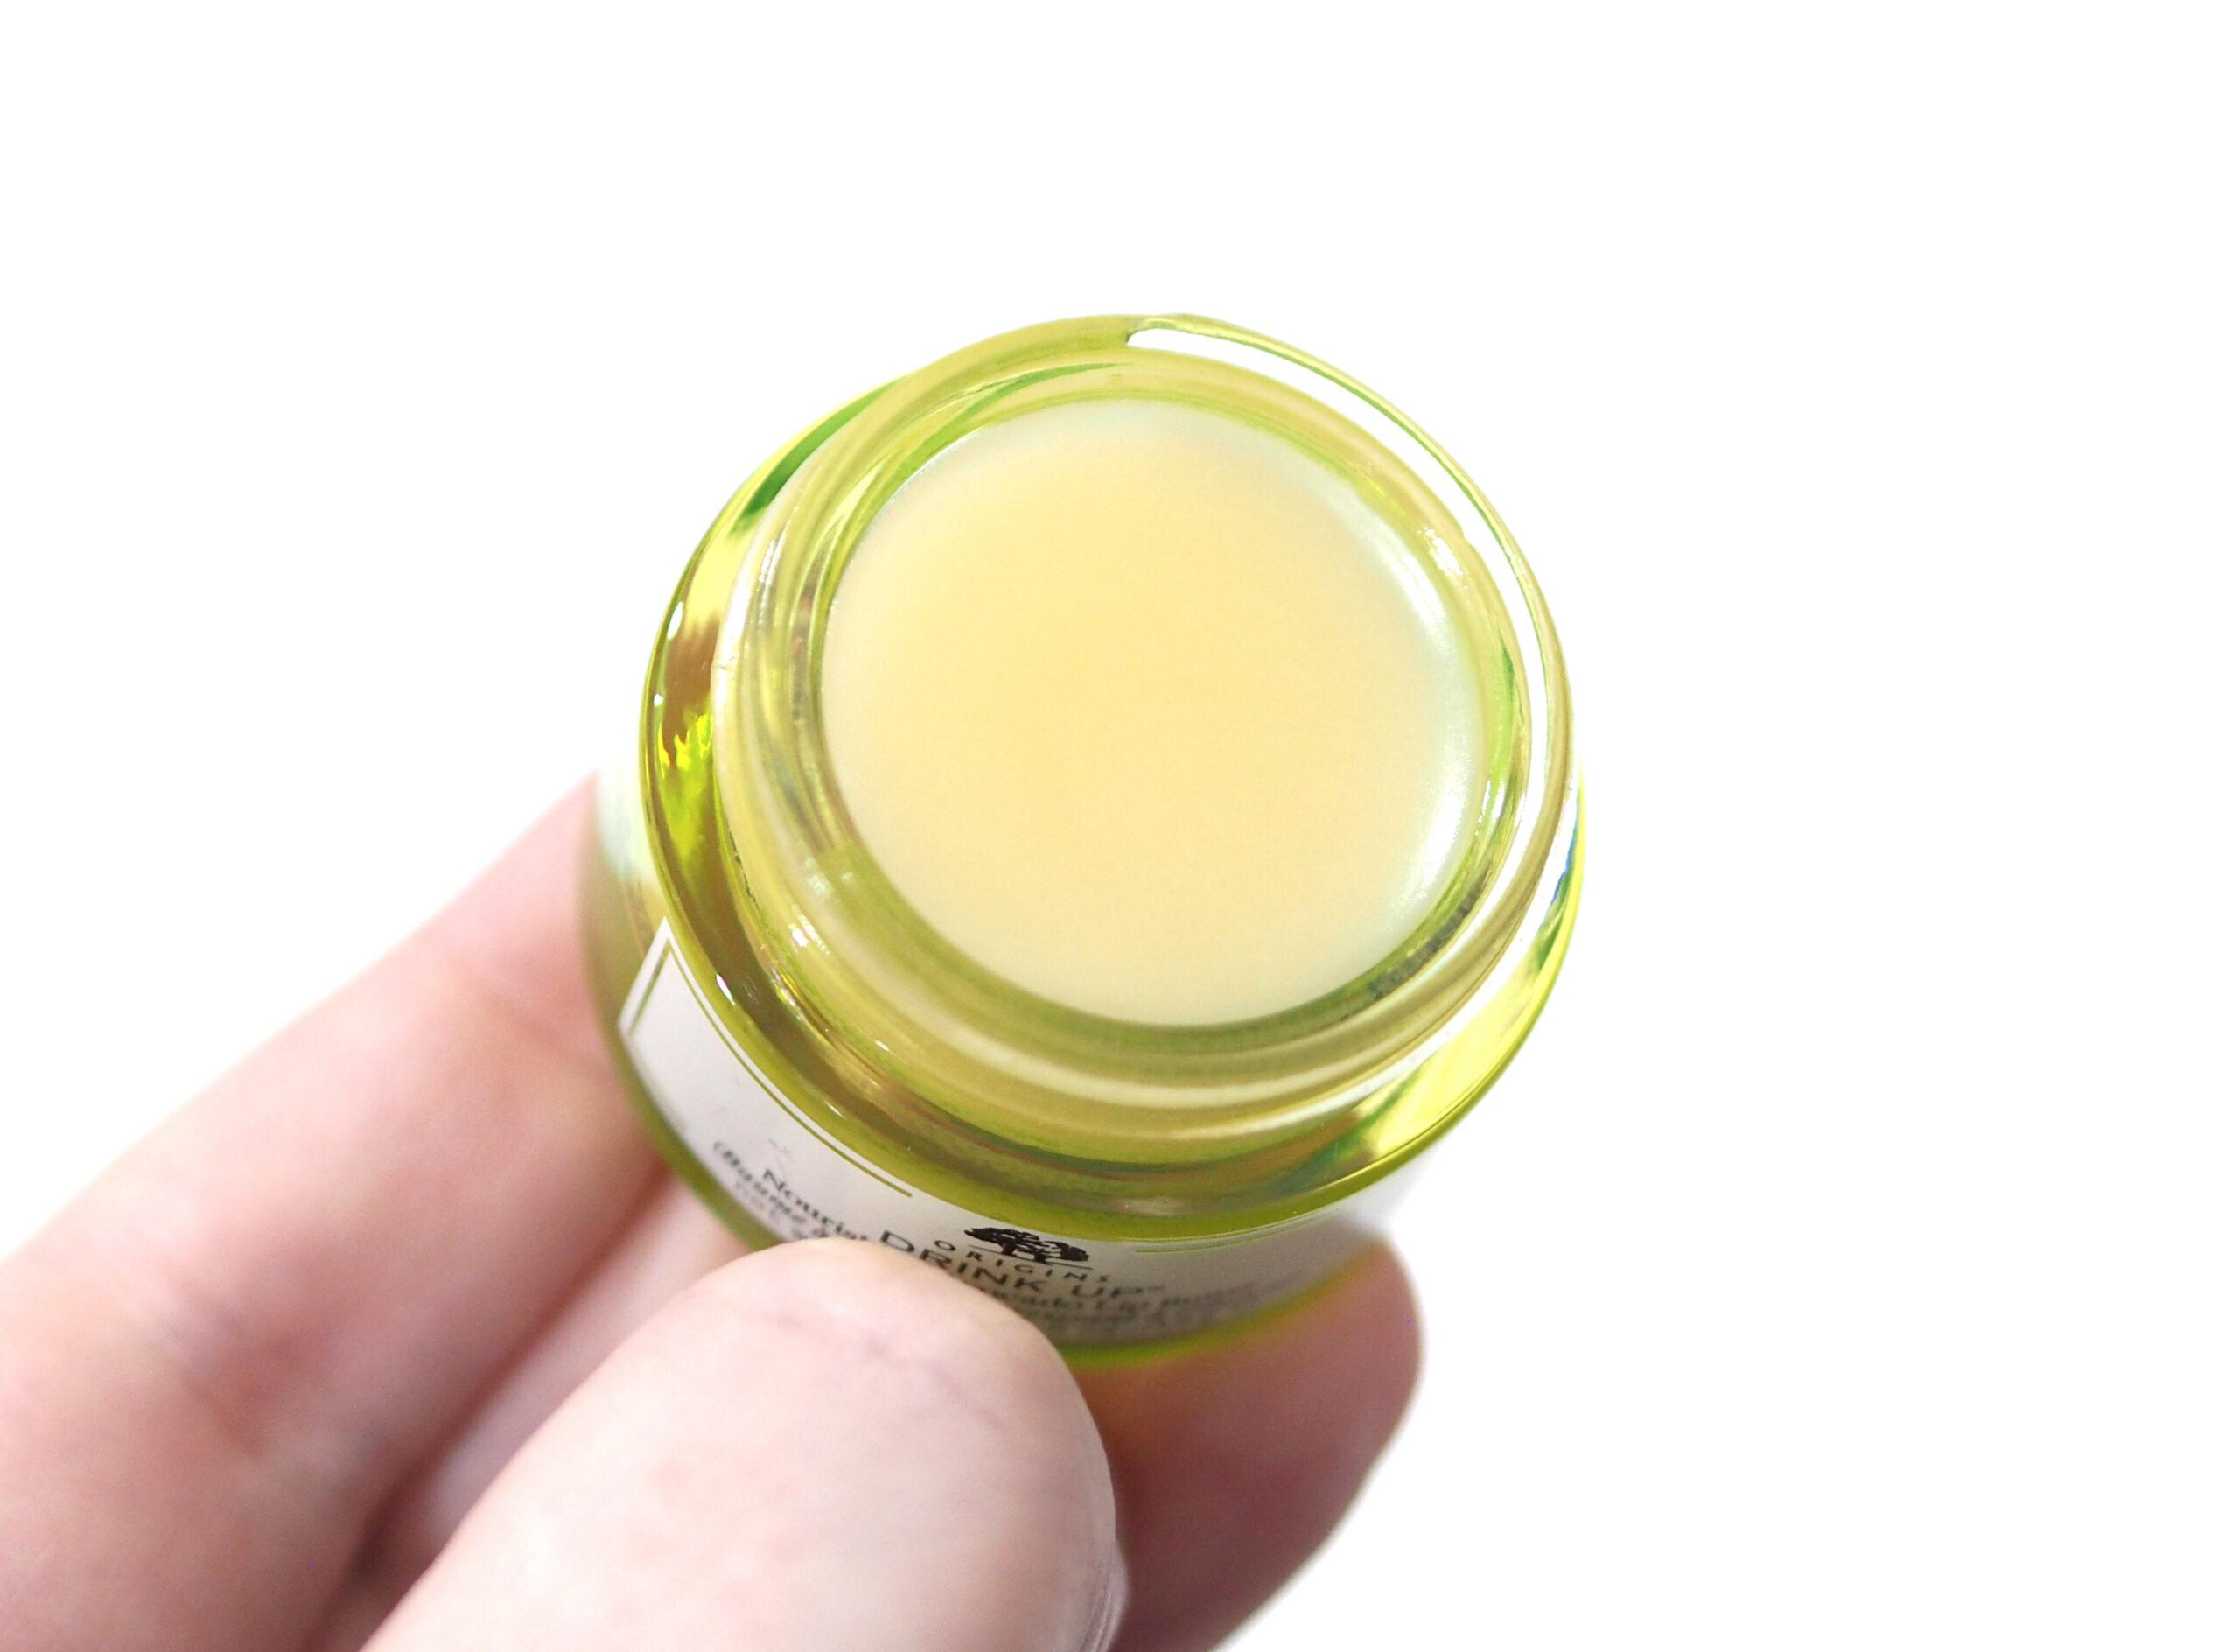 Origins Drink Up Nourishing Avocado Lip Butter